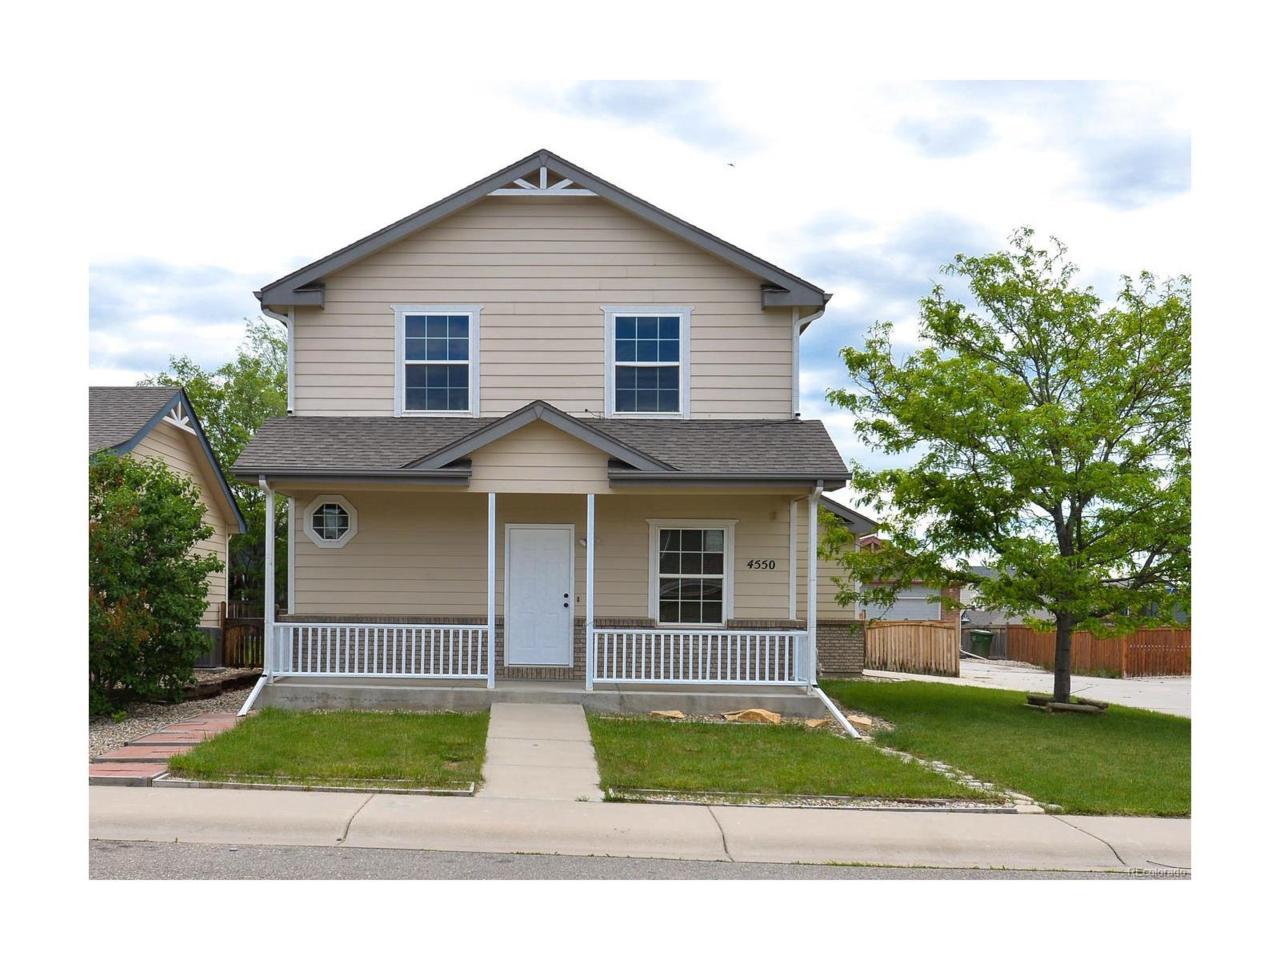 4550 Mead Place, Loveland, CO 80538 (MLS #1815234) :: 8z Real Estate